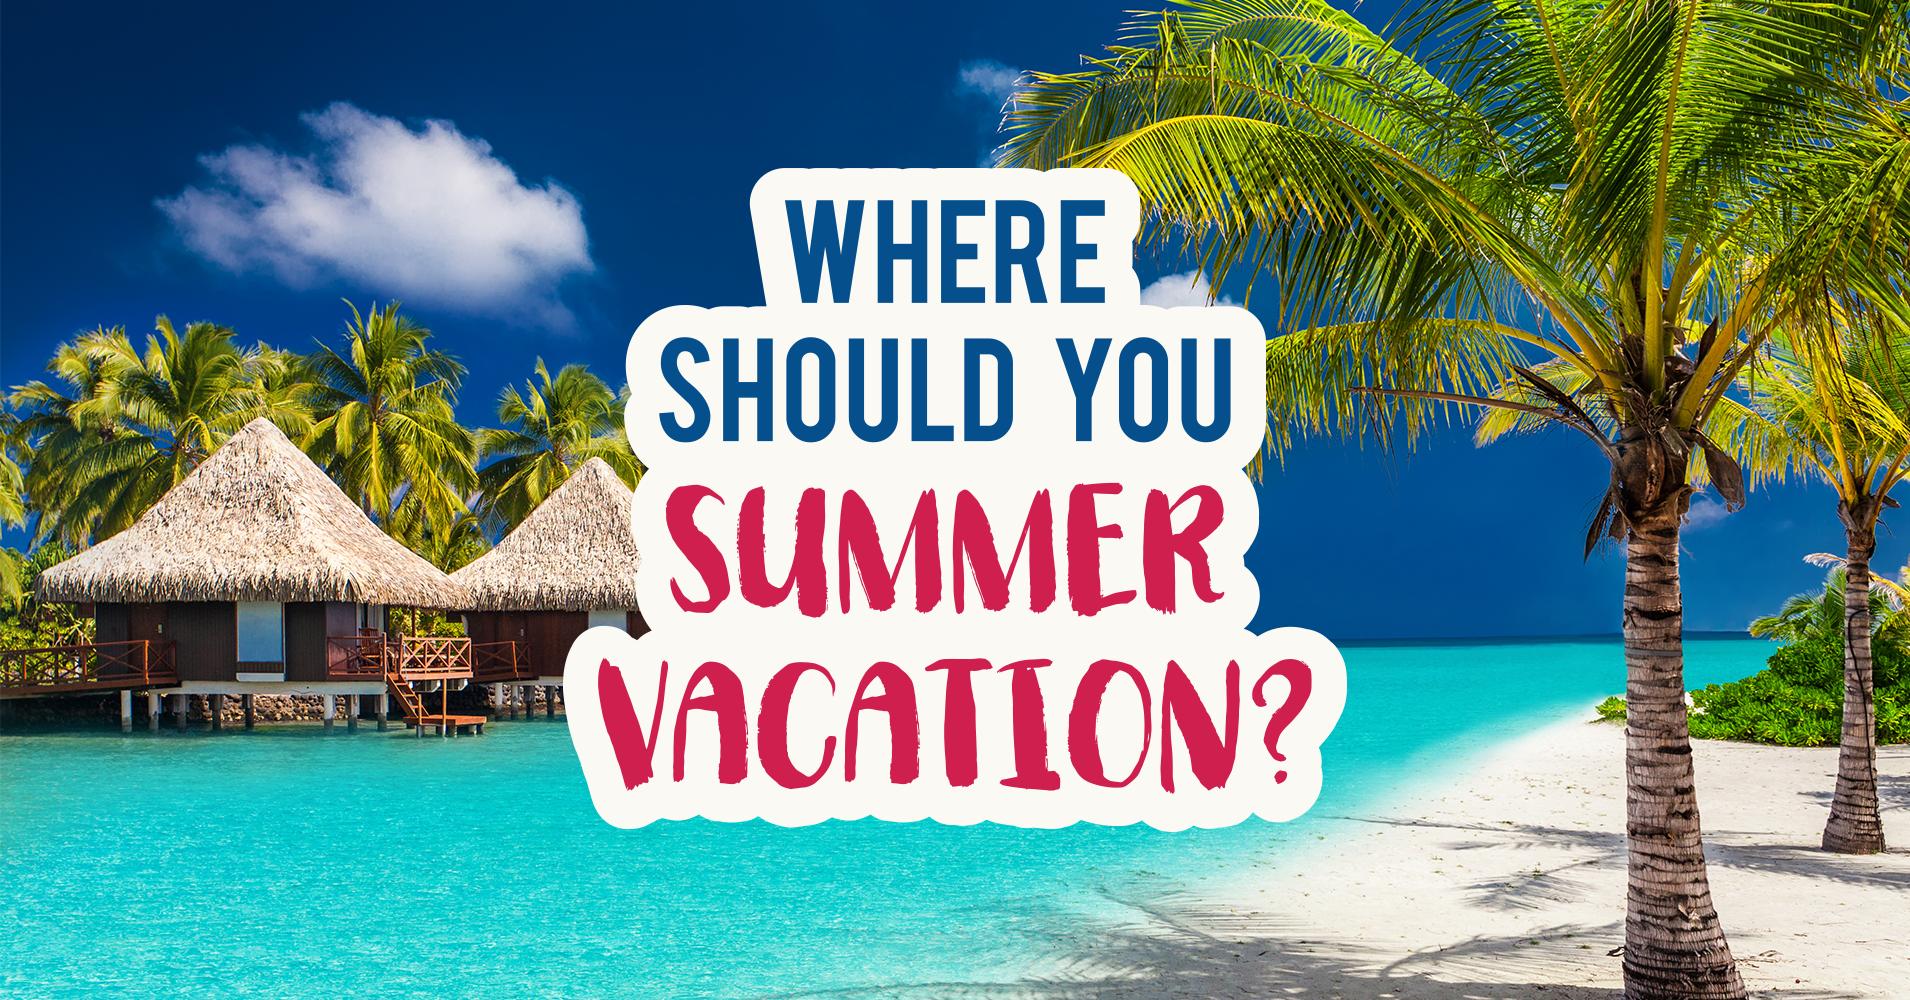 Where Should You Summer Vacation? - Quiz - Quizony.com